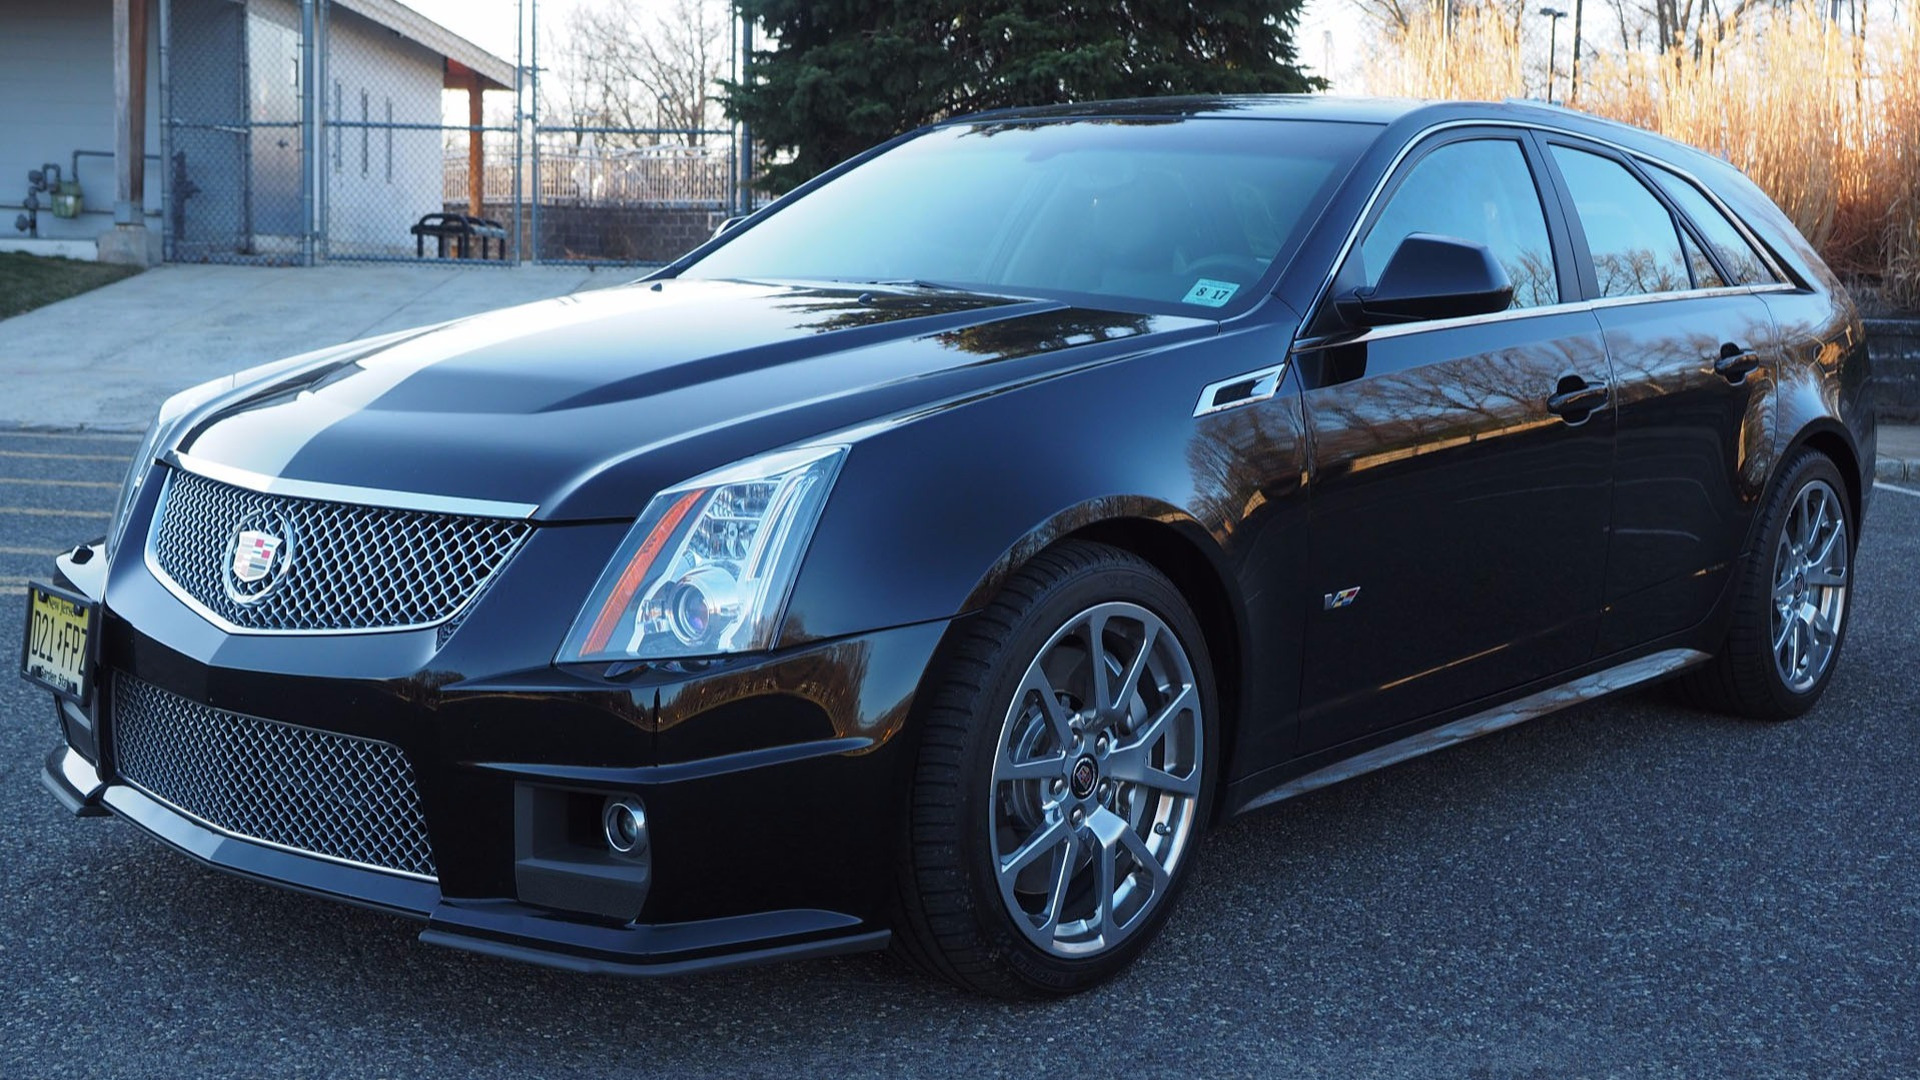 Cadillac Cts-V Wagon For Sale >> Score This Rare 2012 Cadillac CTS-V Manual Wagon While It ...